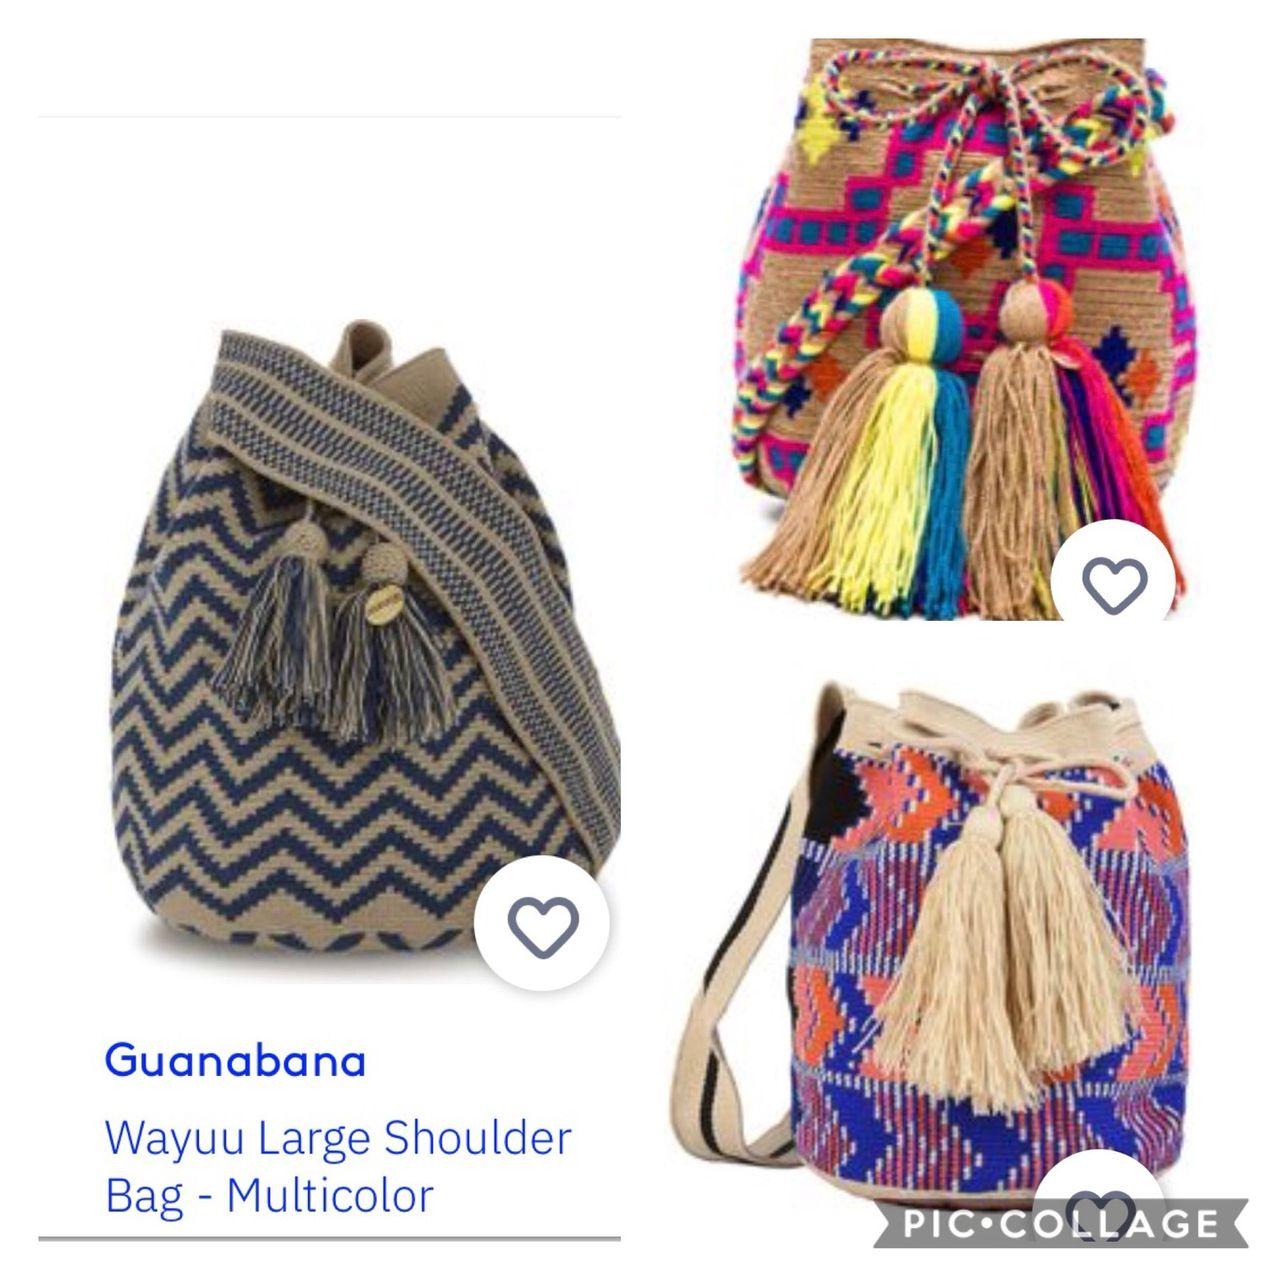 Guanabana veske ønskes kjøpt   FINN.no